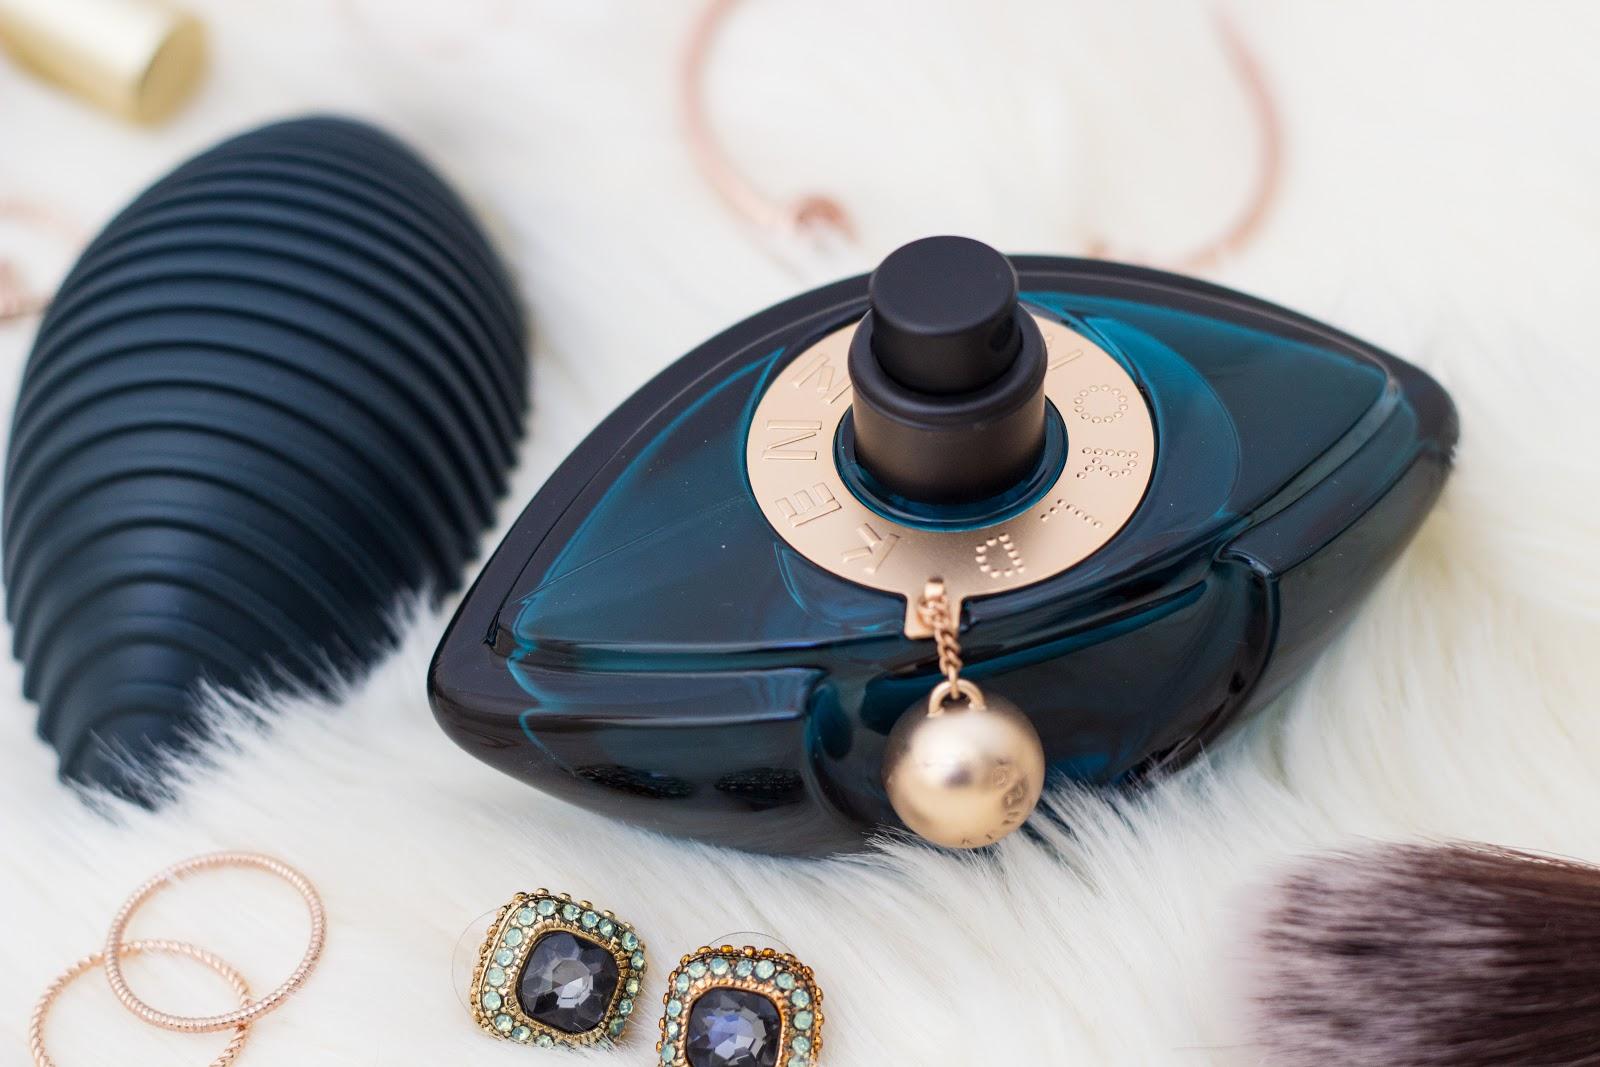 Kenzo World Intense Eau de Parfum Flatlay